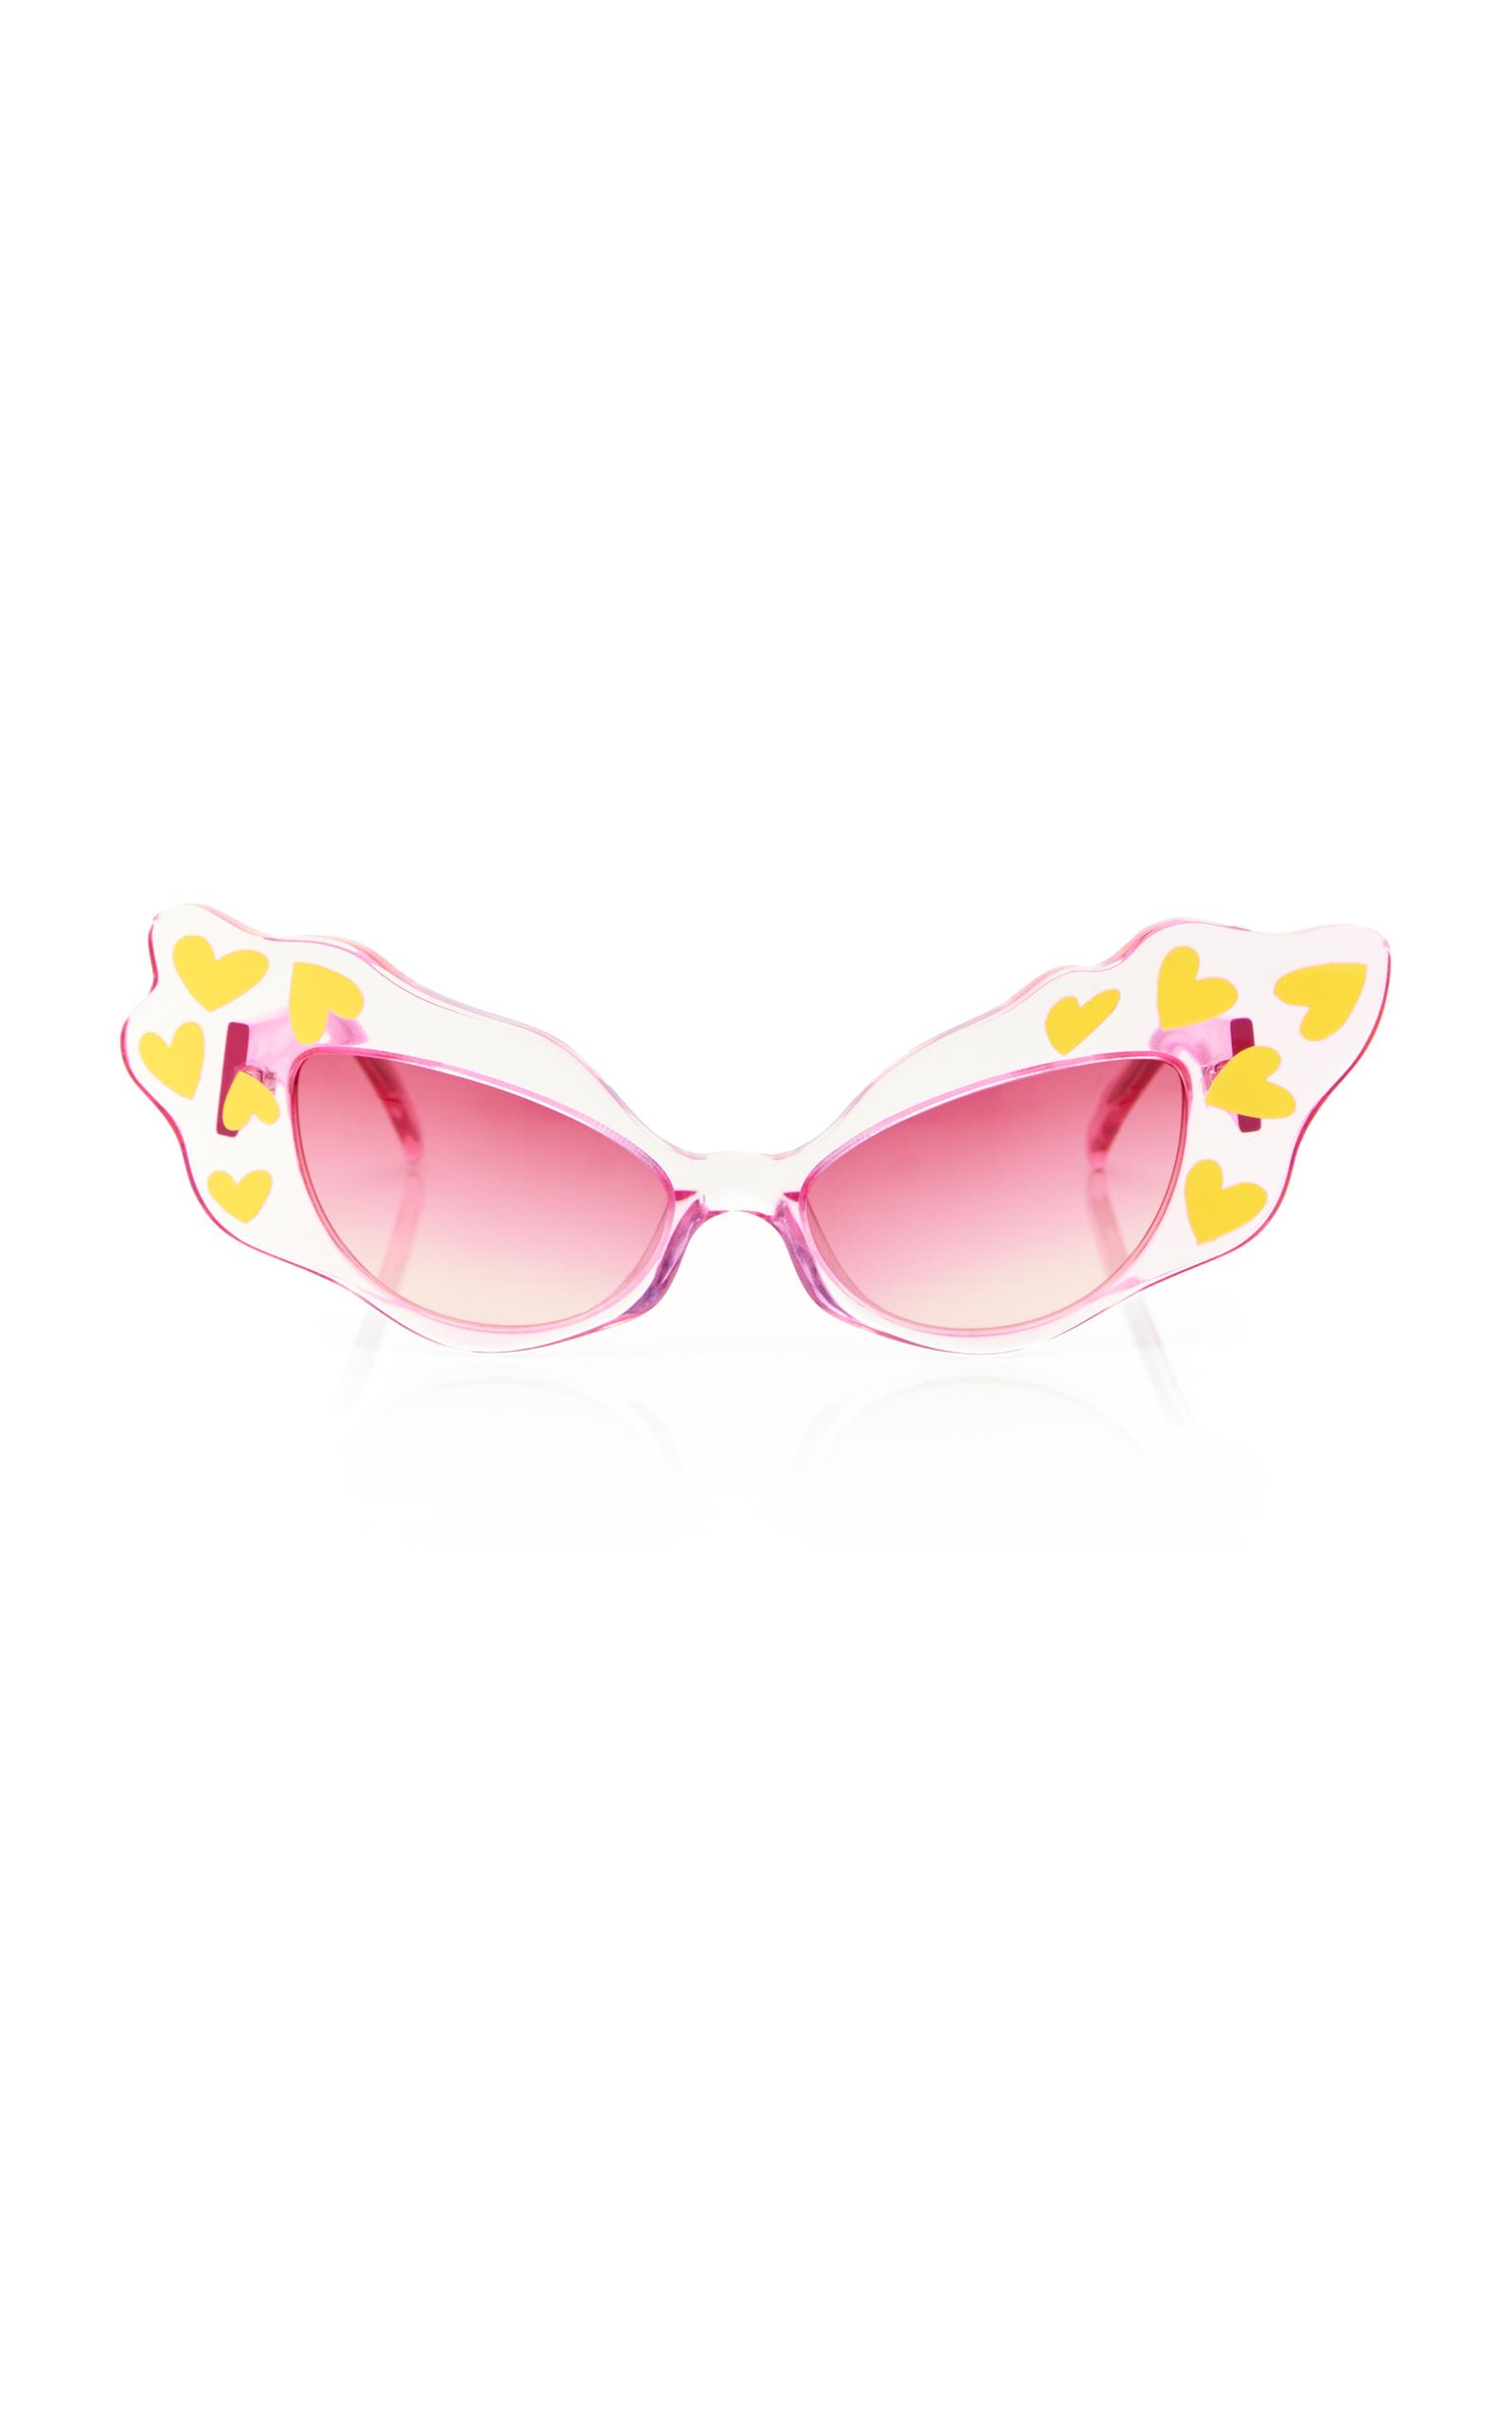 9273512f01 Agatha Ruiz de la PradaCat-eye Sunglasses. CLOSE. Loading